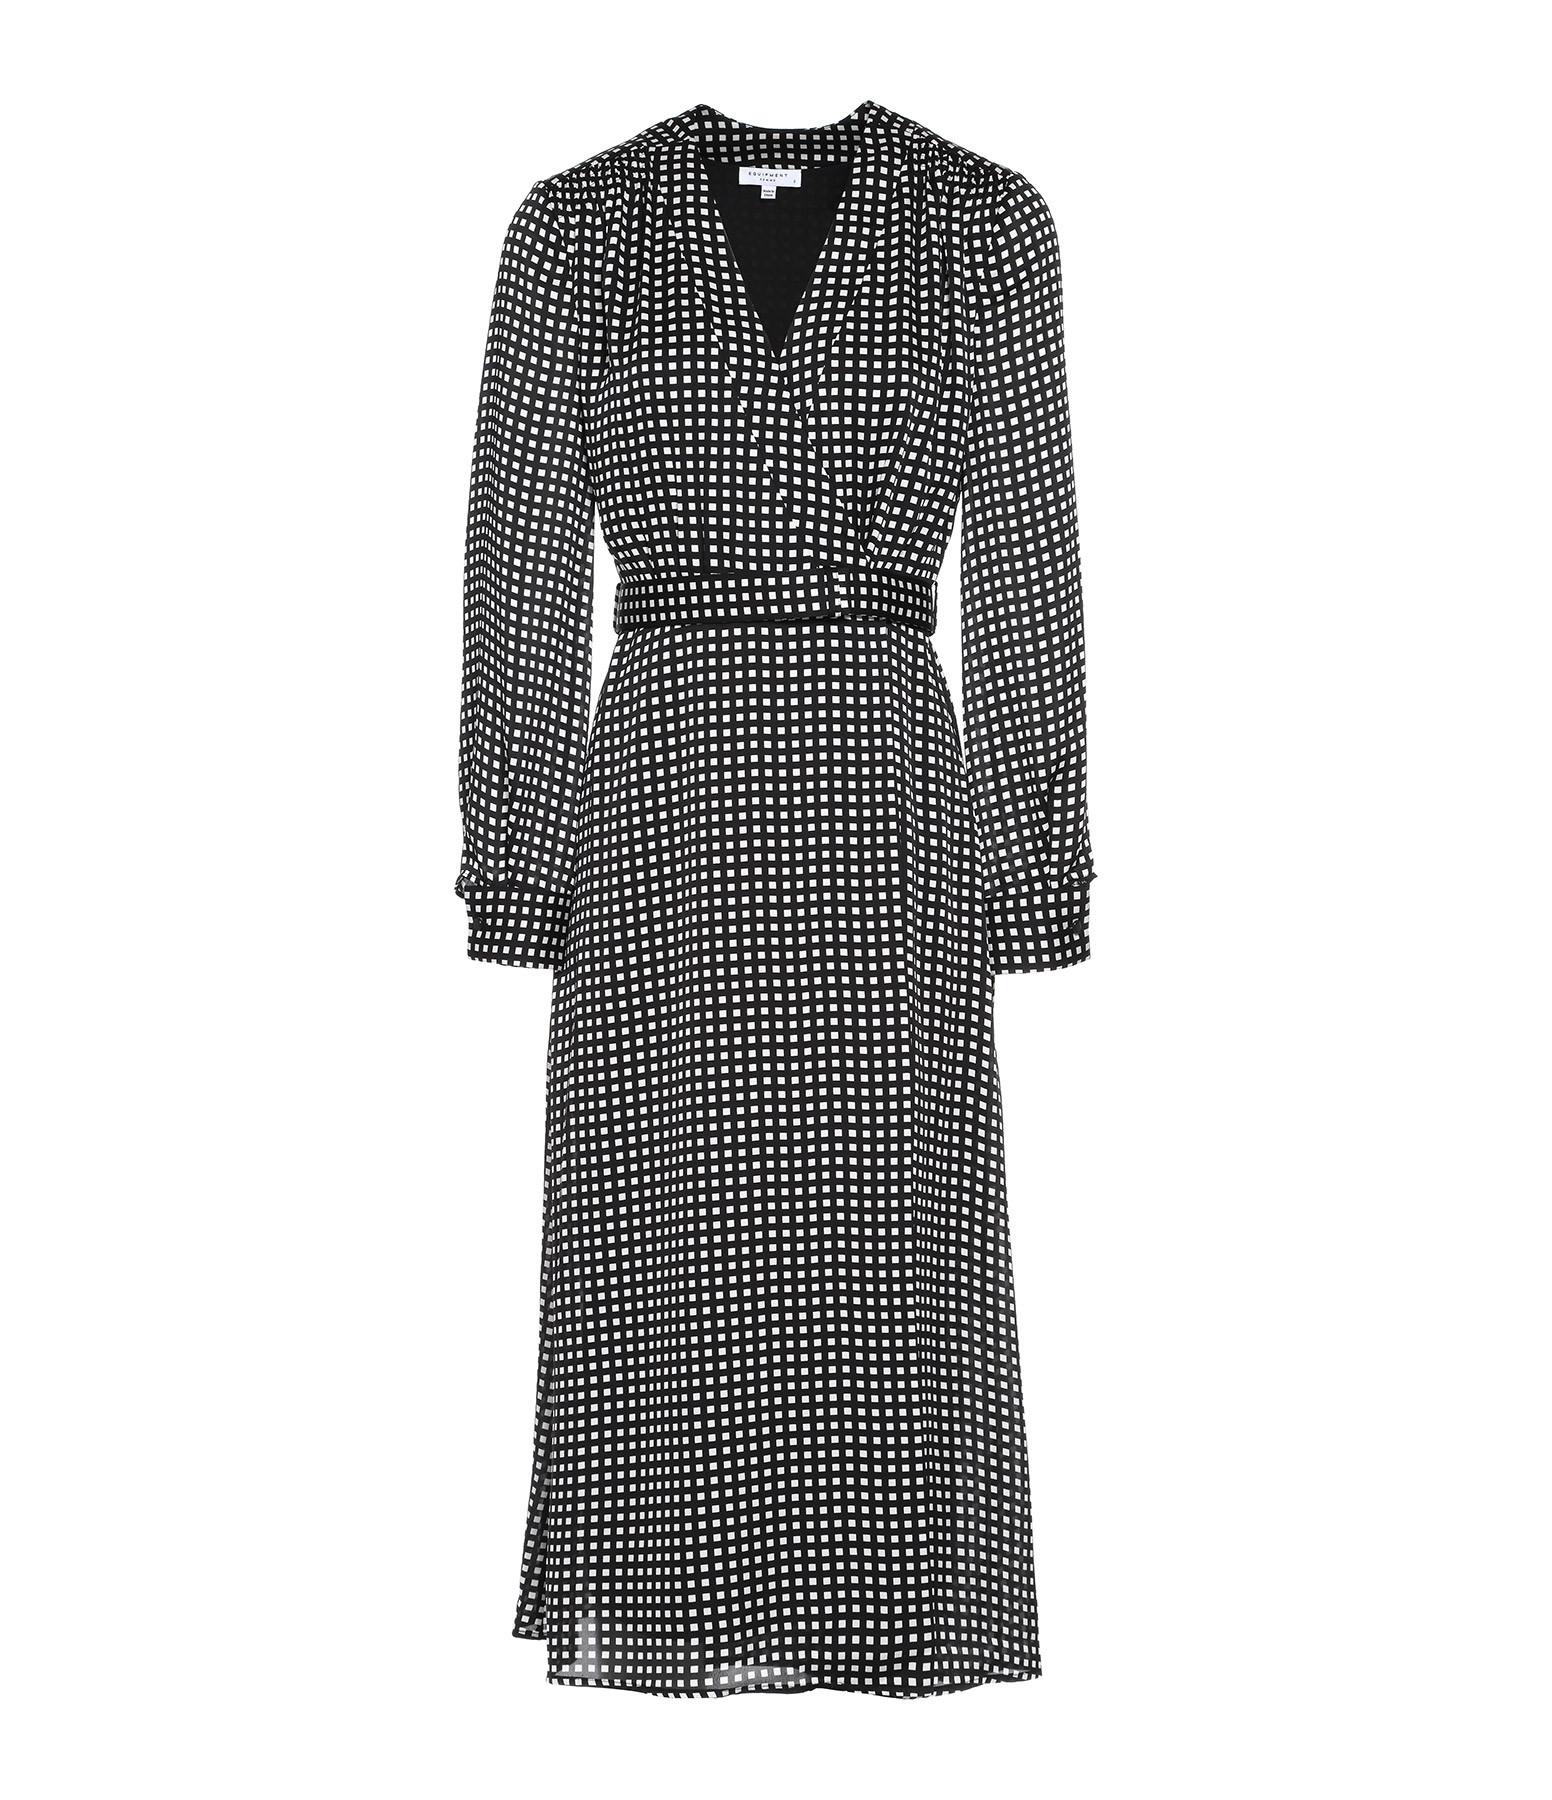 EQUIPMENT - Robe Kortini Noir Blanc